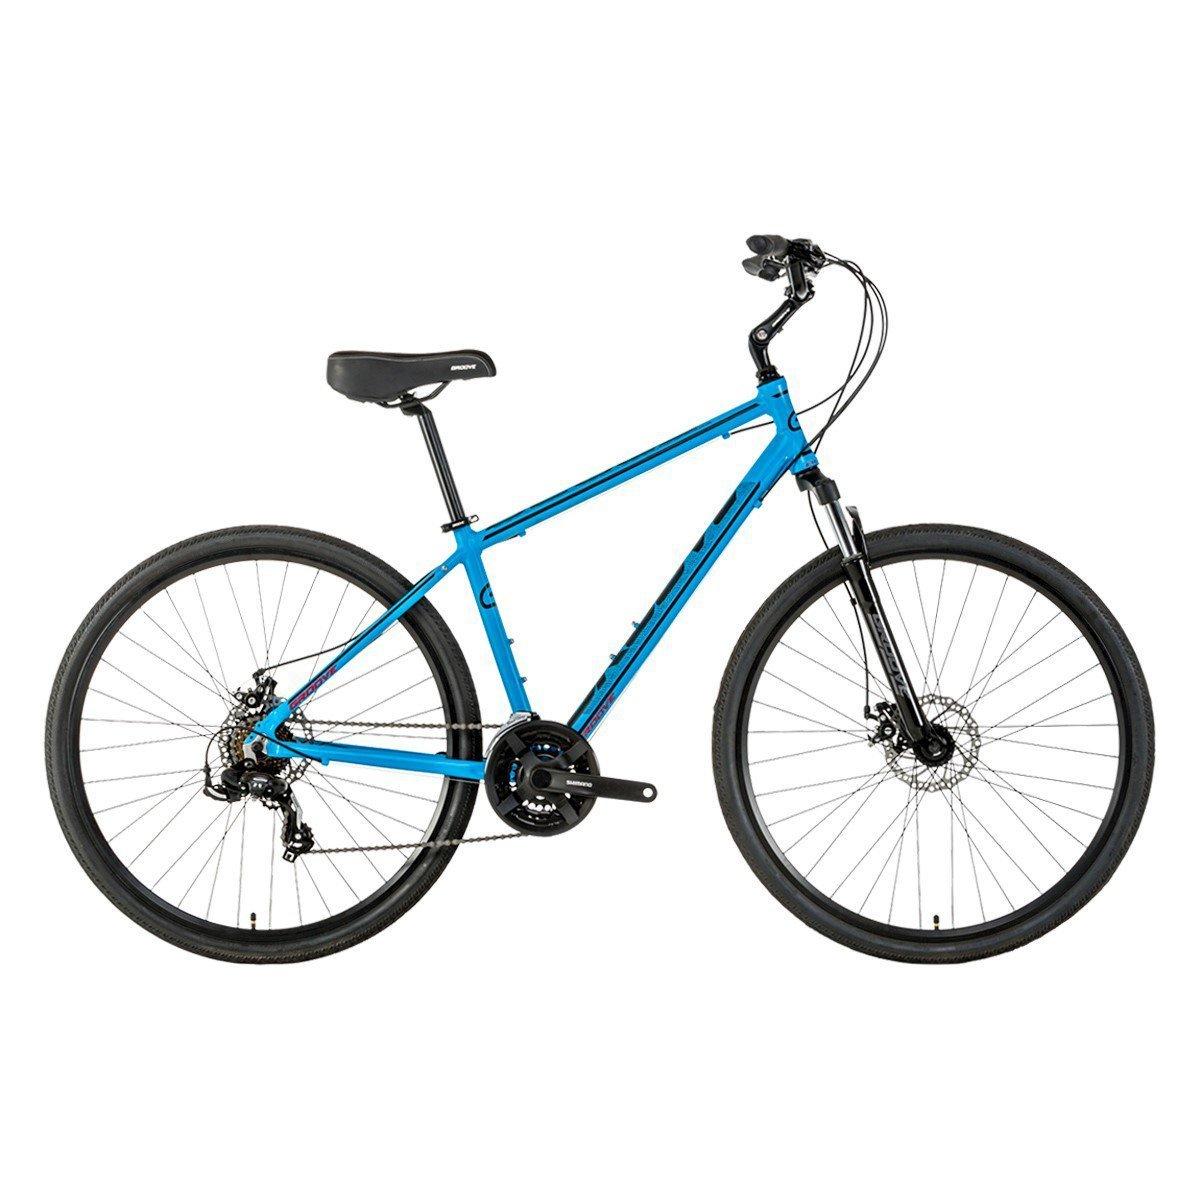 Bicicleta Groove Blues Disc Confort & Urbana 700c 21vel 2018